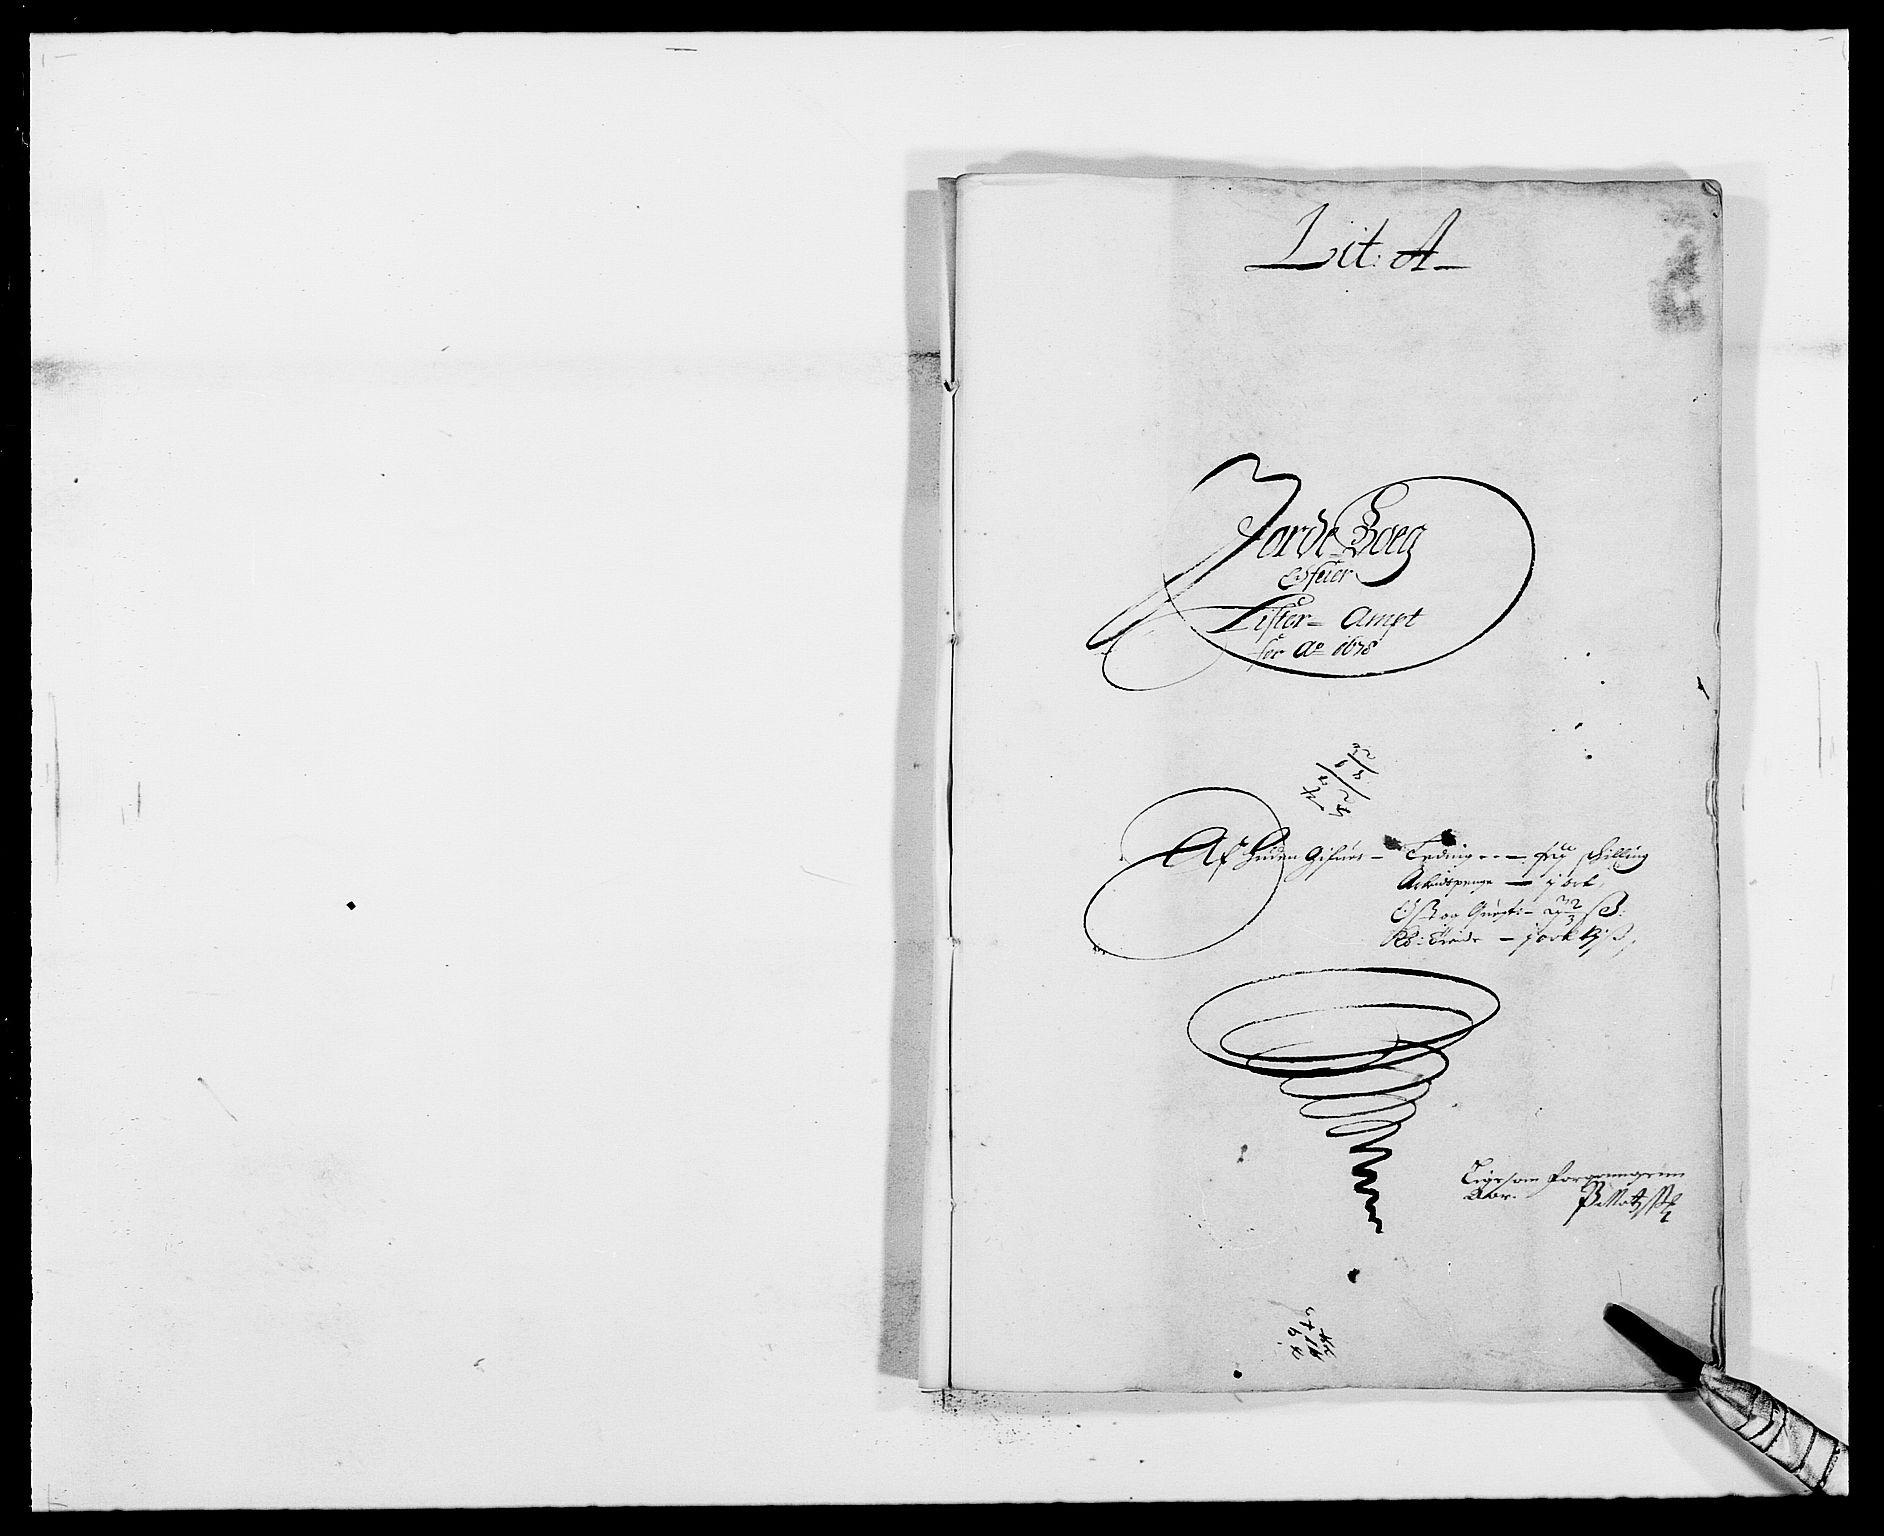 RA, Rentekammeret inntil 1814, Reviderte regnskaper, Fogderegnskap, R41/L2530: Fogderegnskap Lista, 1677-1679, s. 171